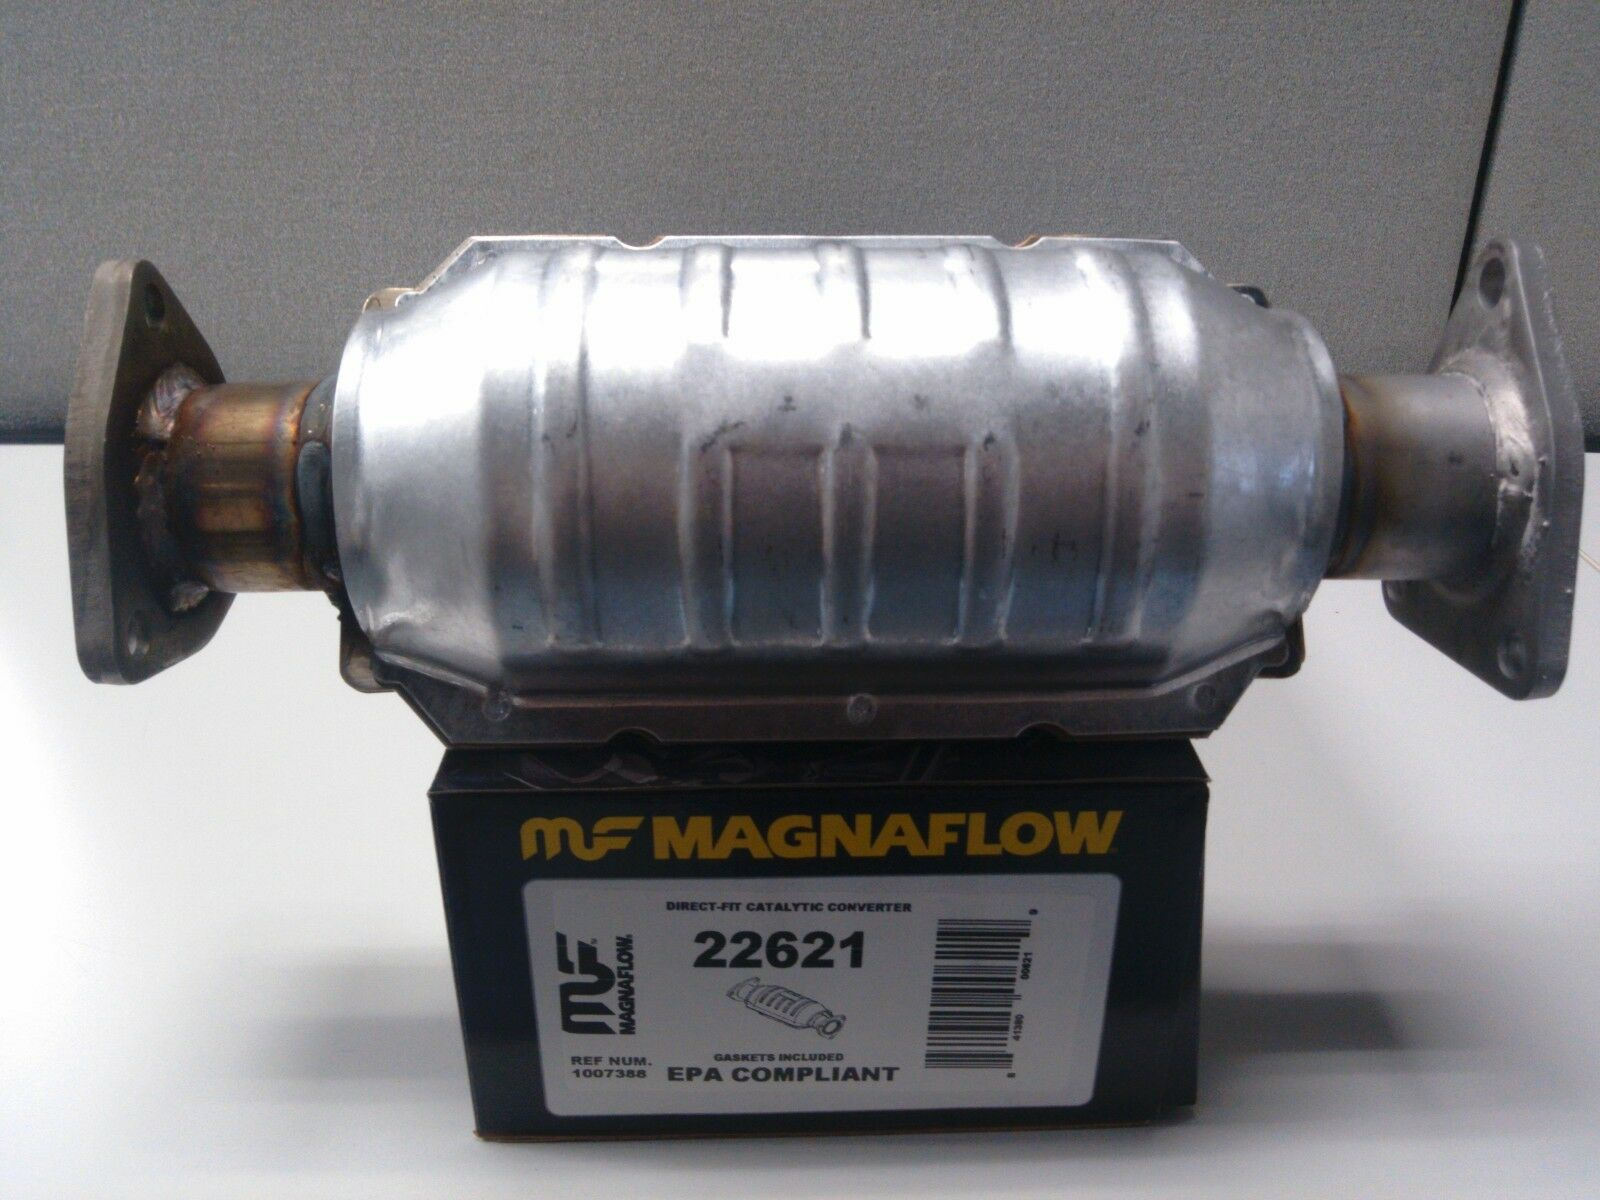 MagnaFlow Direct Fit Catalytic Converter 1997 to 2001 Honda CR-V 2.0L $50 rebate